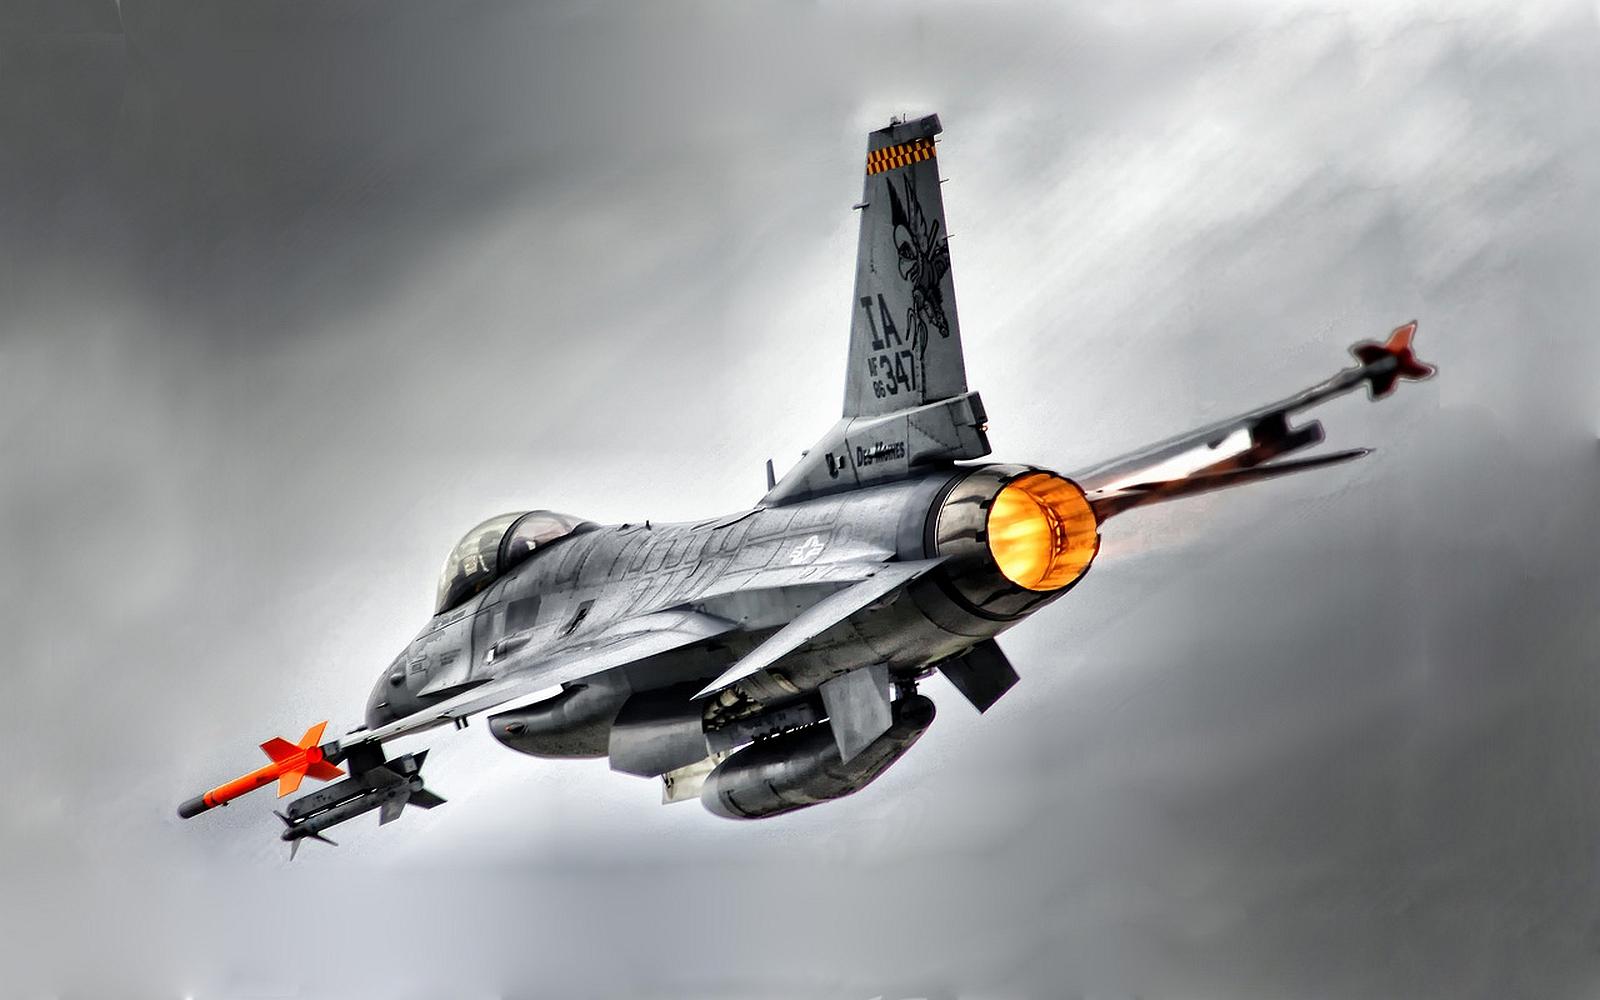 General Dynamics F 16 Fighting Falcon Hd Wallpaper: General Dynamics F-16 Fighting Falcon Wallpaper And